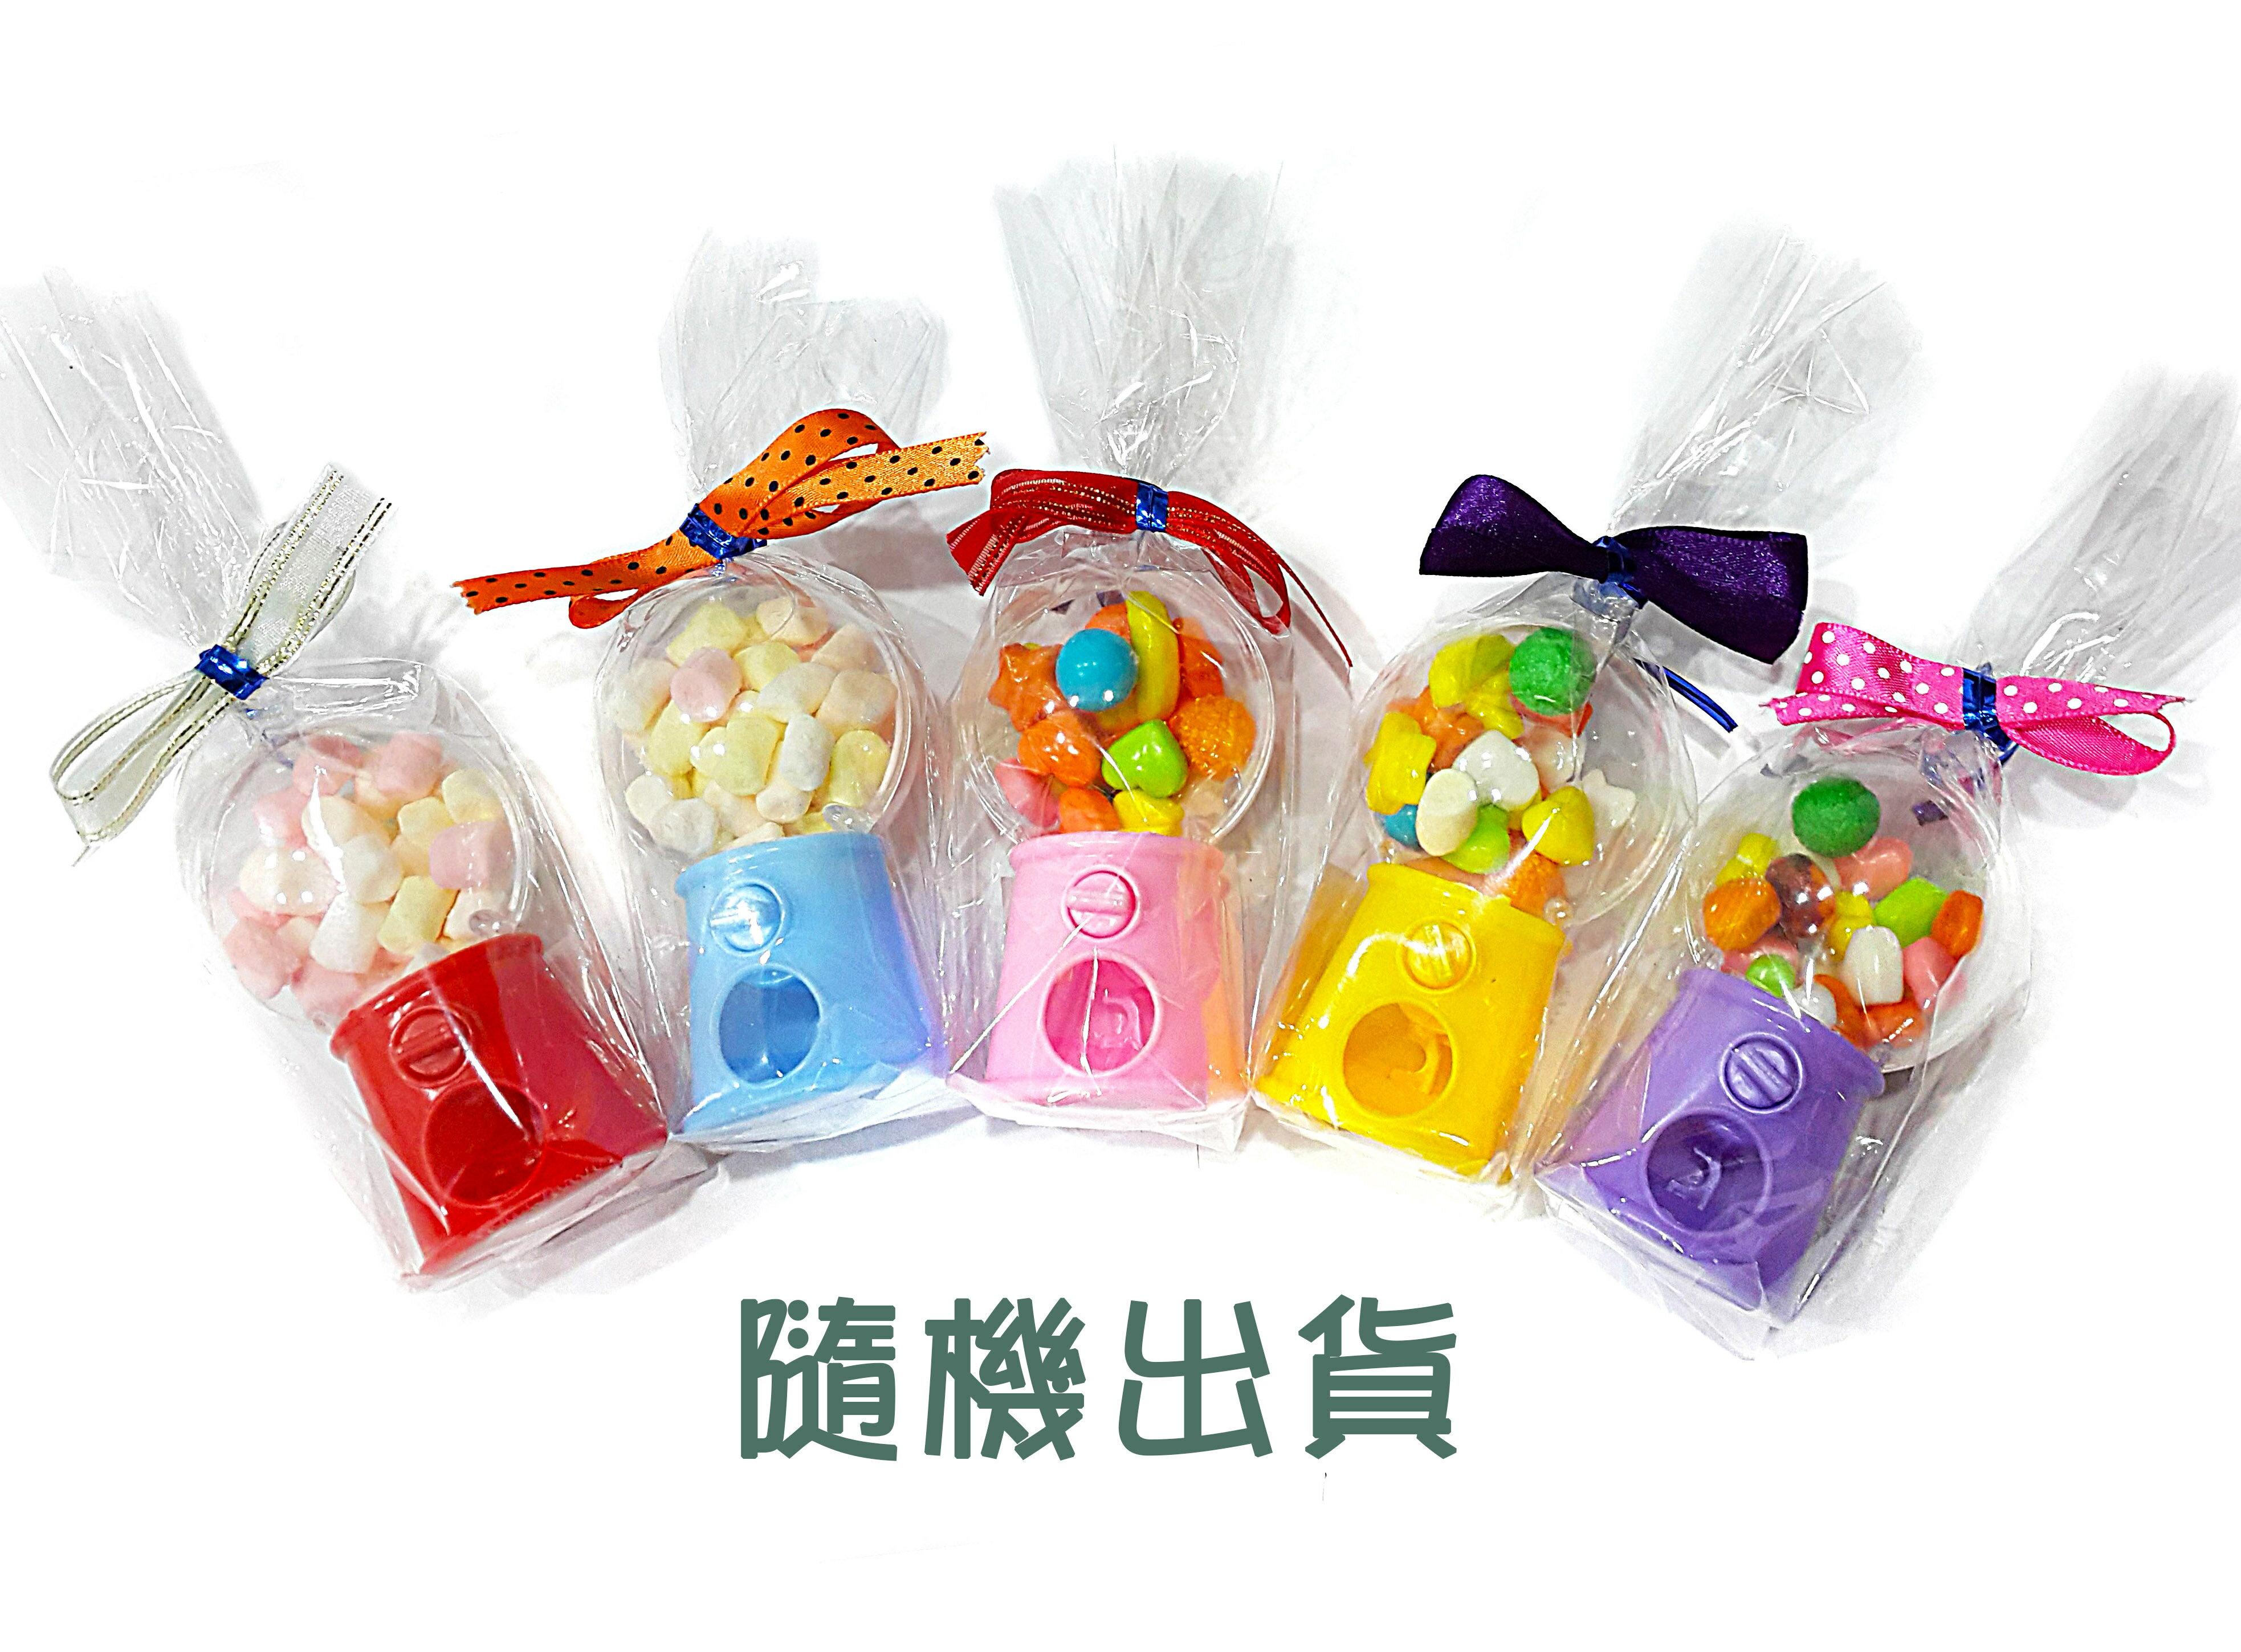 X射線【Y040001】迷你扭蛋機 糖果組(不挑色),糖果襪/糖果罐/聖誕節/交換禮物/婚禮小物/兒童節/禮物/